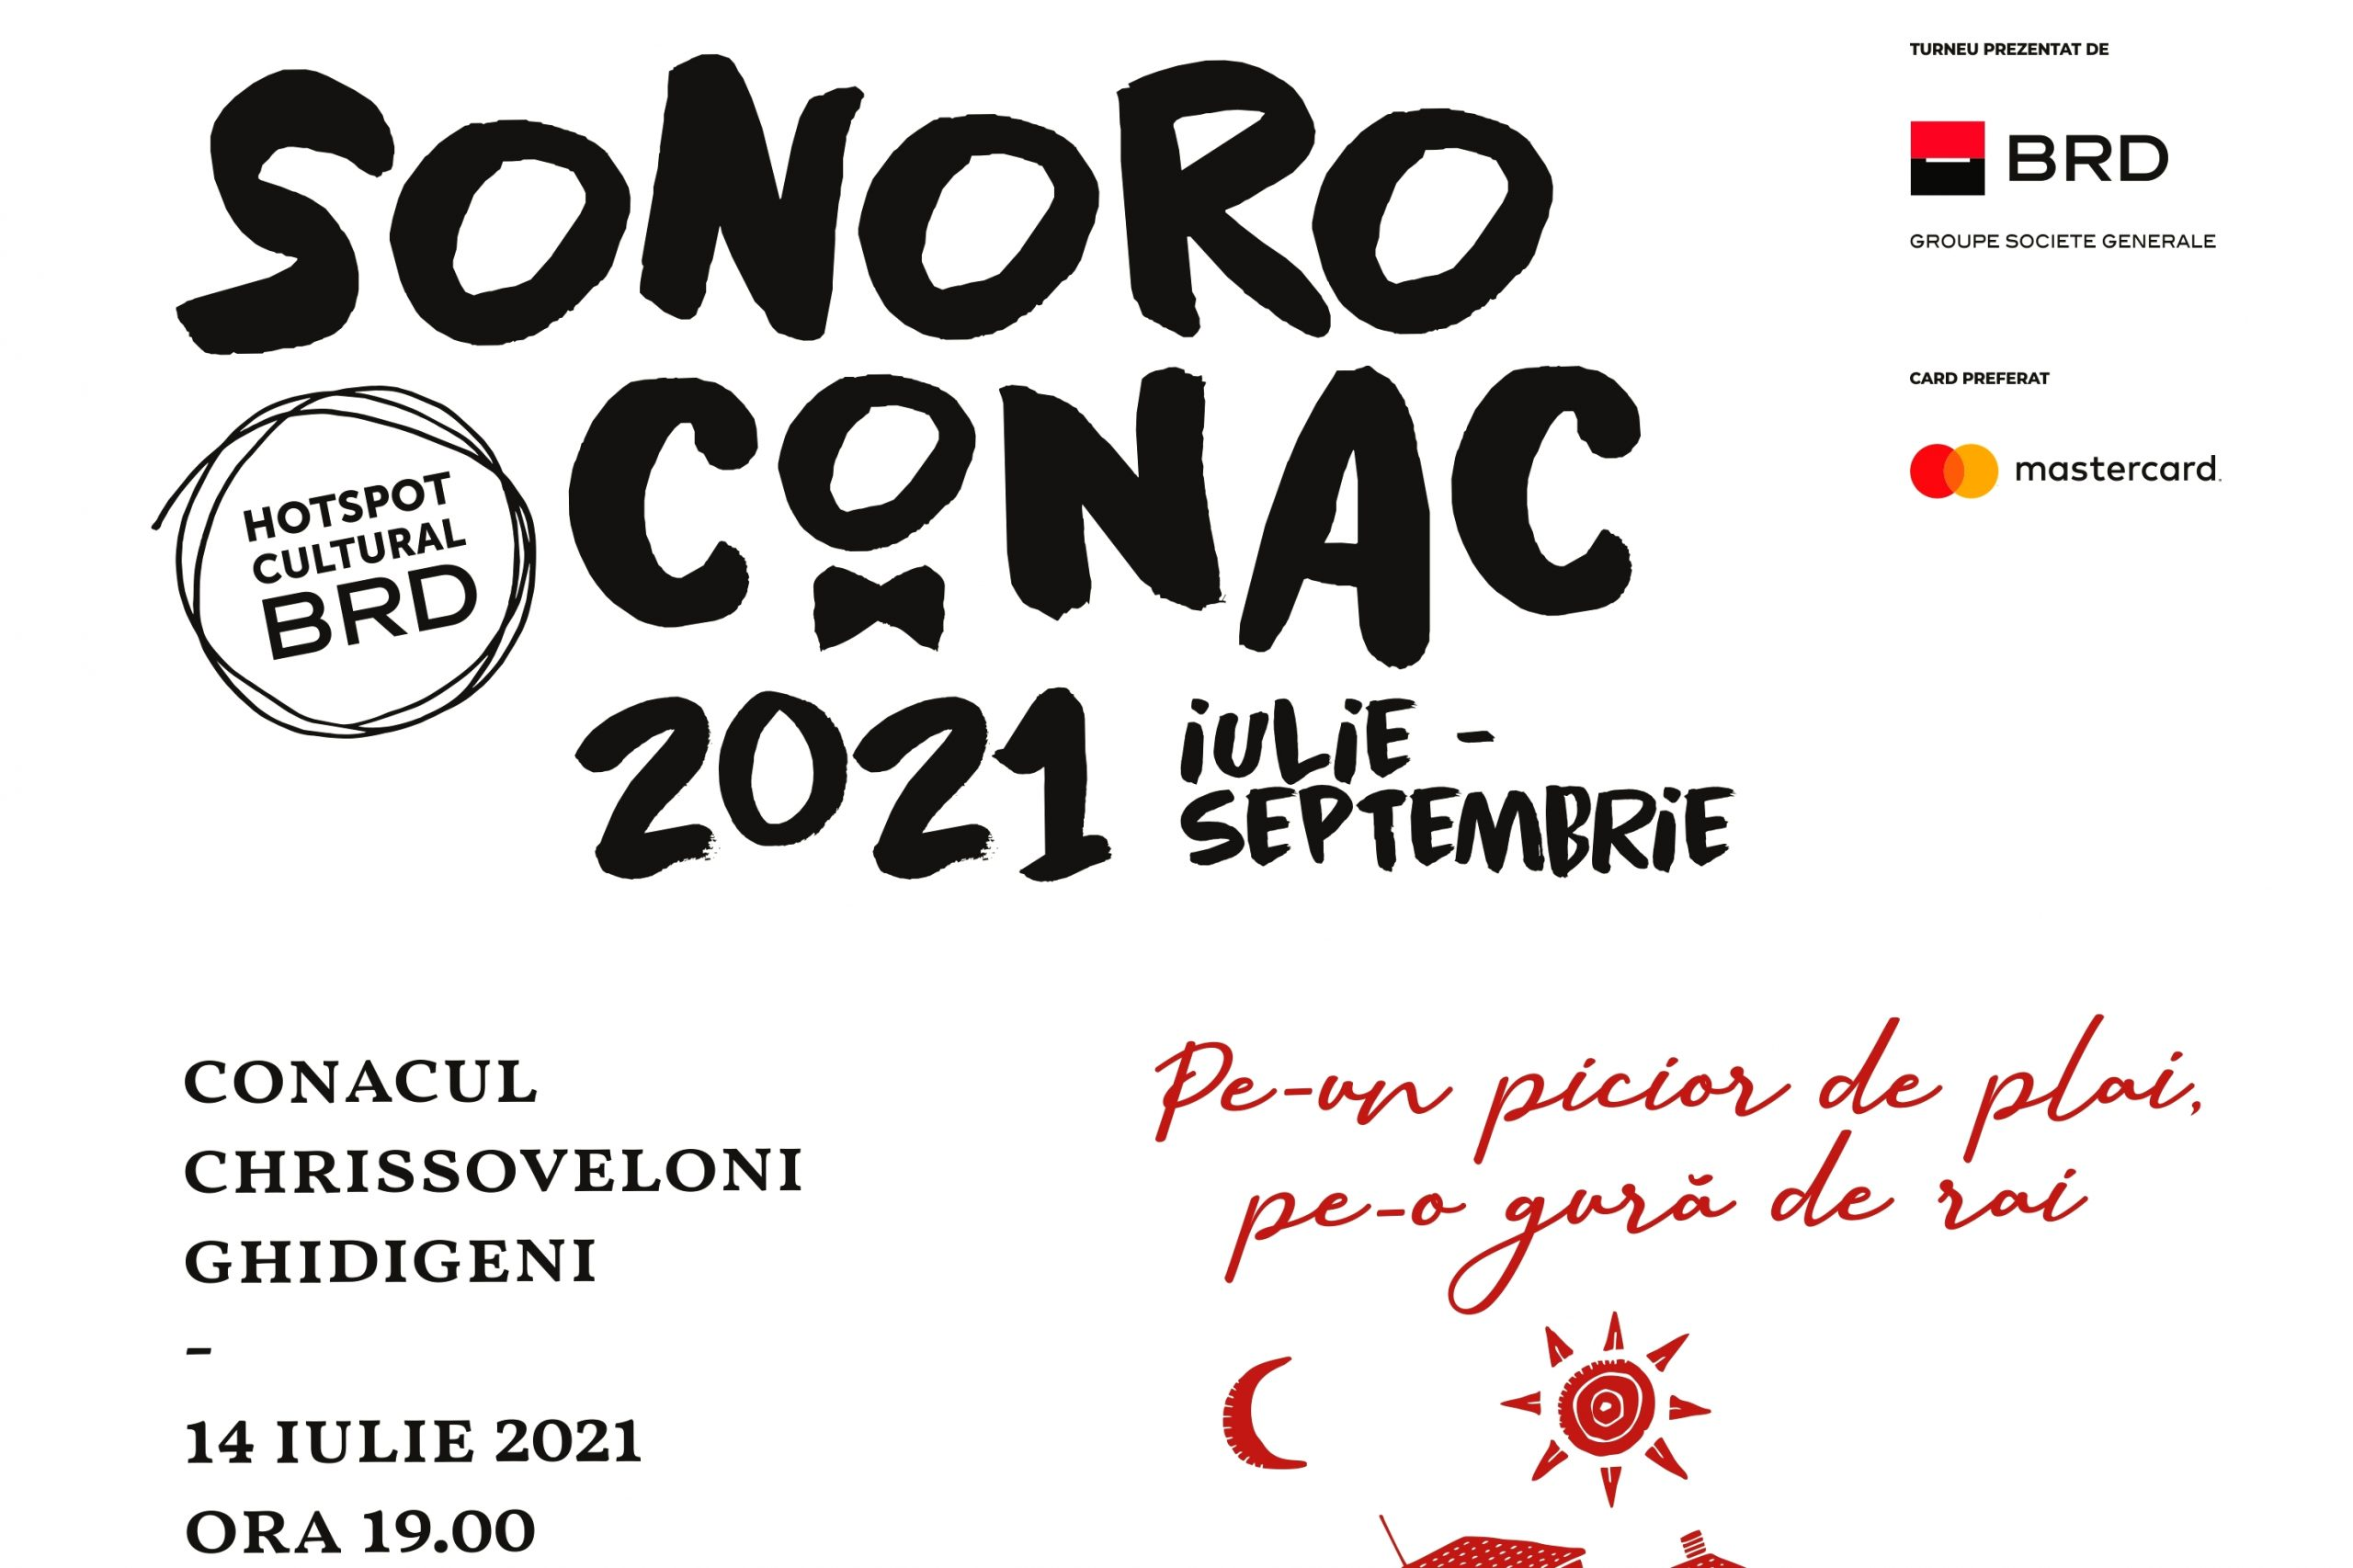 SoNoRo Conac, a IX-a ediție, 2021